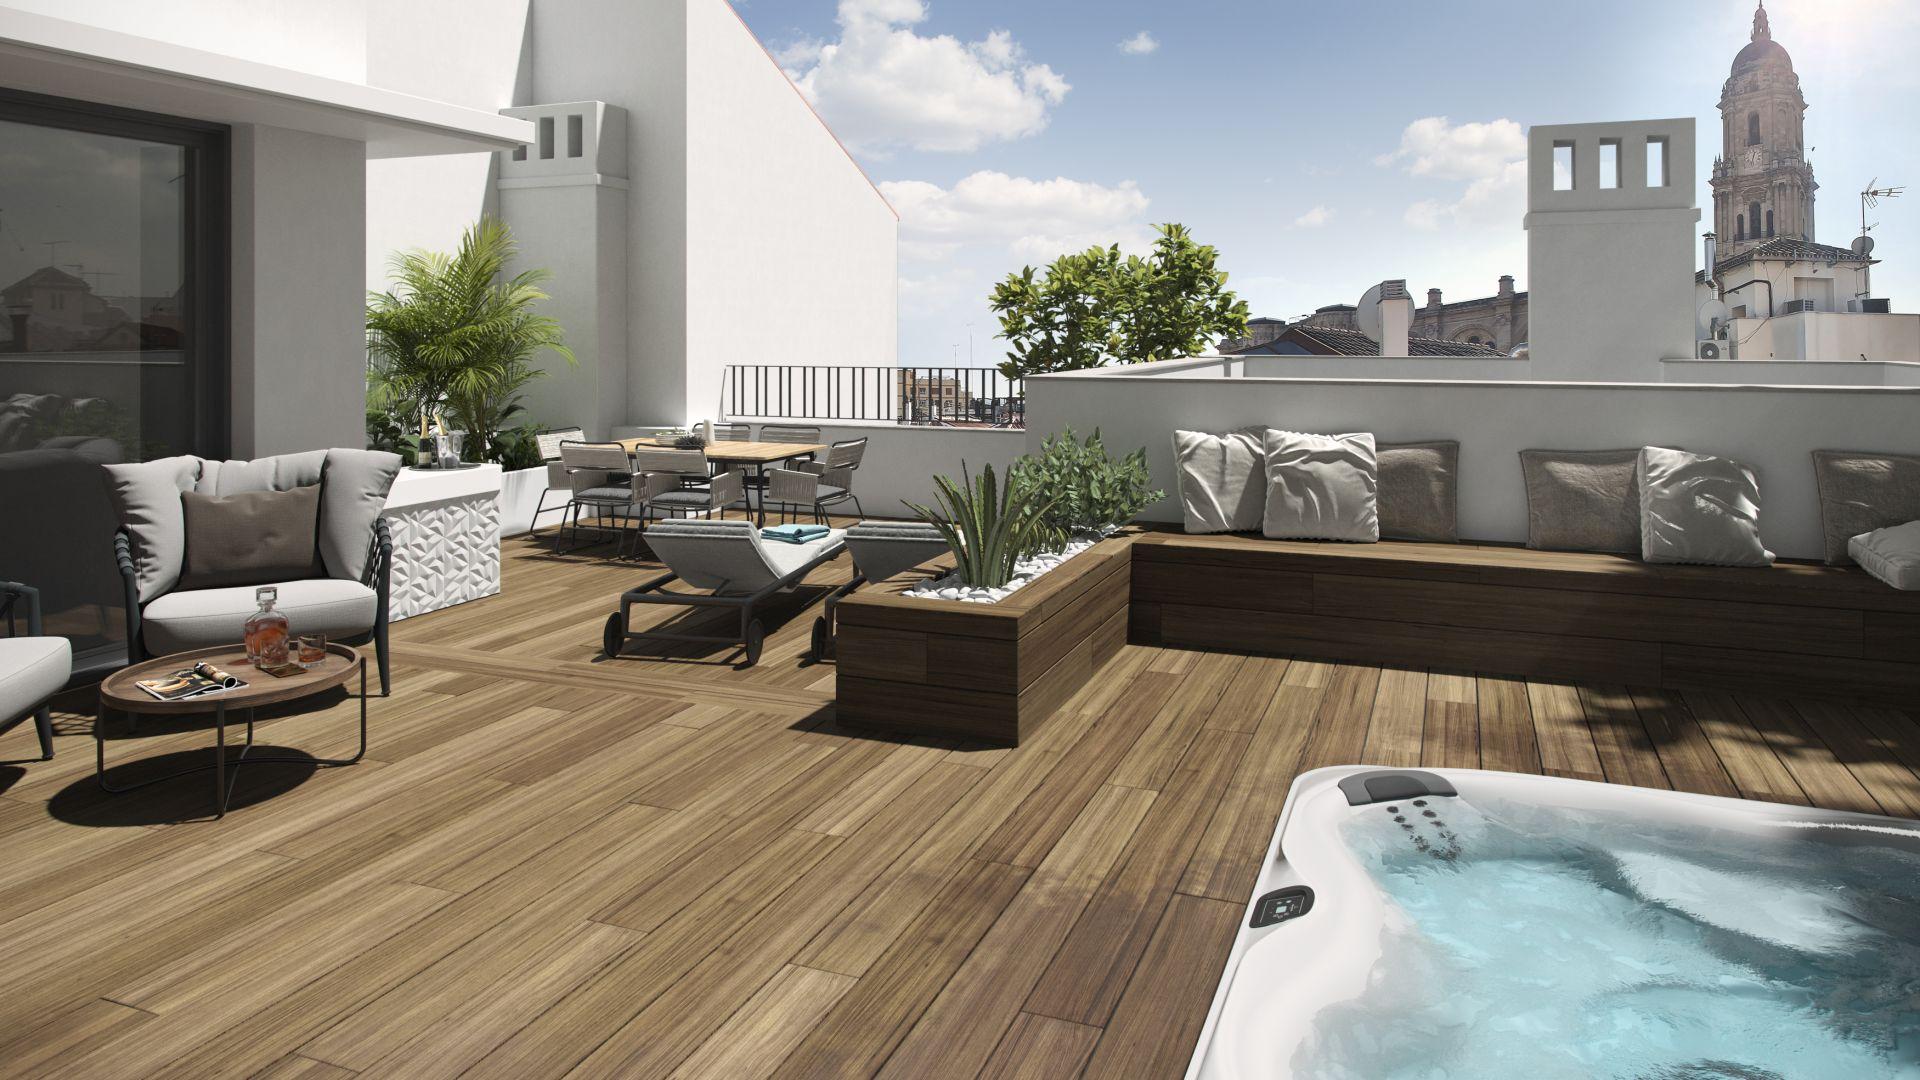 Correo Viejo, Malaga - Luxury dwellings in Málaga's historic city centre | Christie's International Real Estate